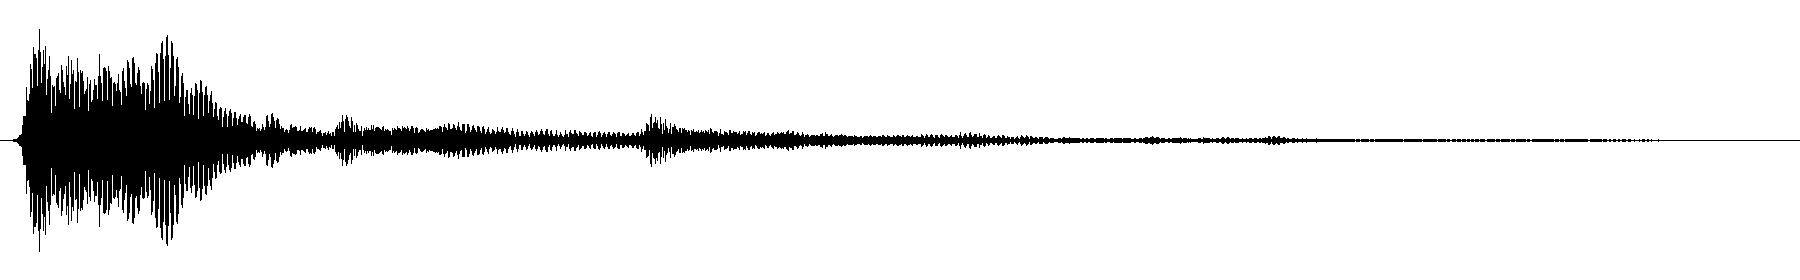 128 c